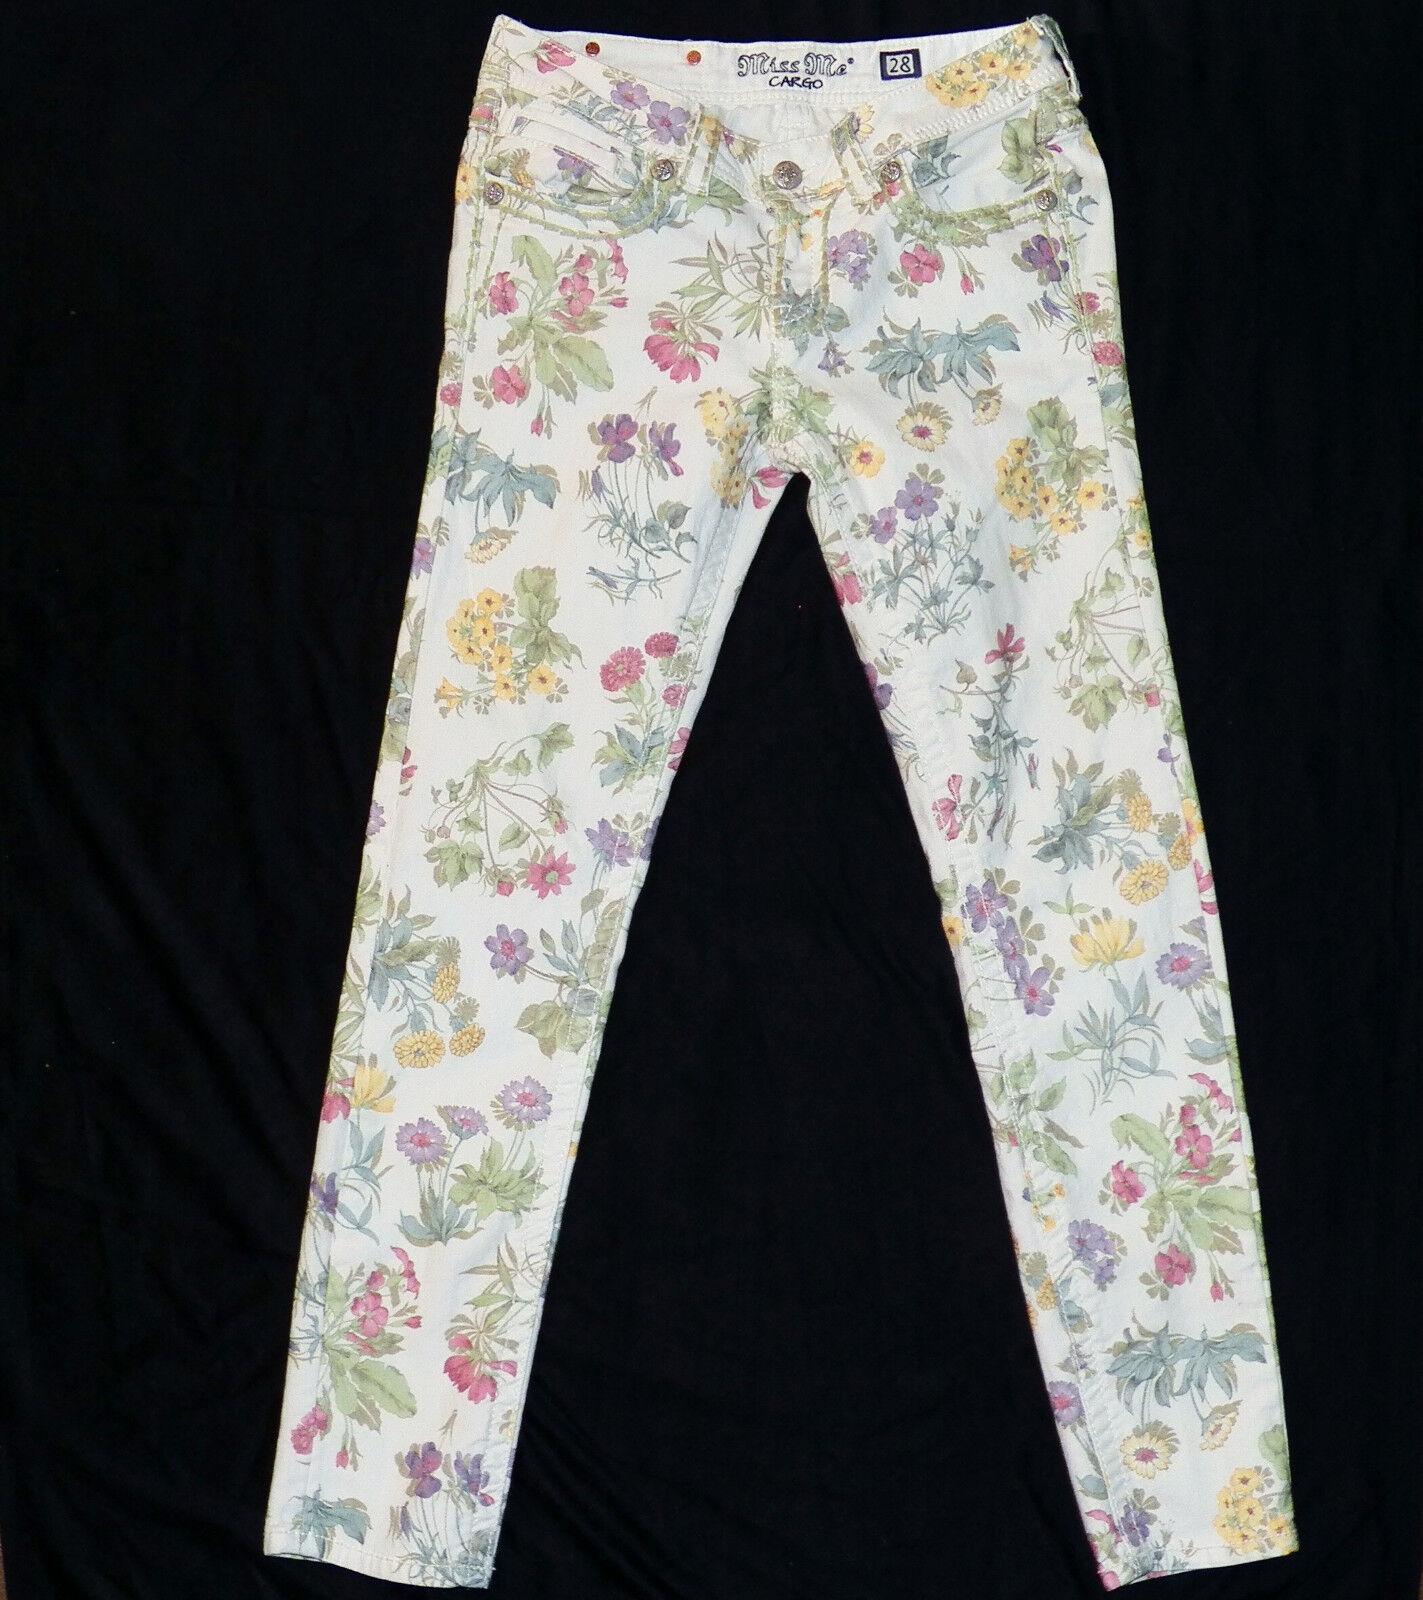 Miss Me Stampa Botanico Stampa Me Floreale Avorio Denim Skinny Jeans Cargo  CP4025AK1 28 x 058375 27d02ffa9ef8